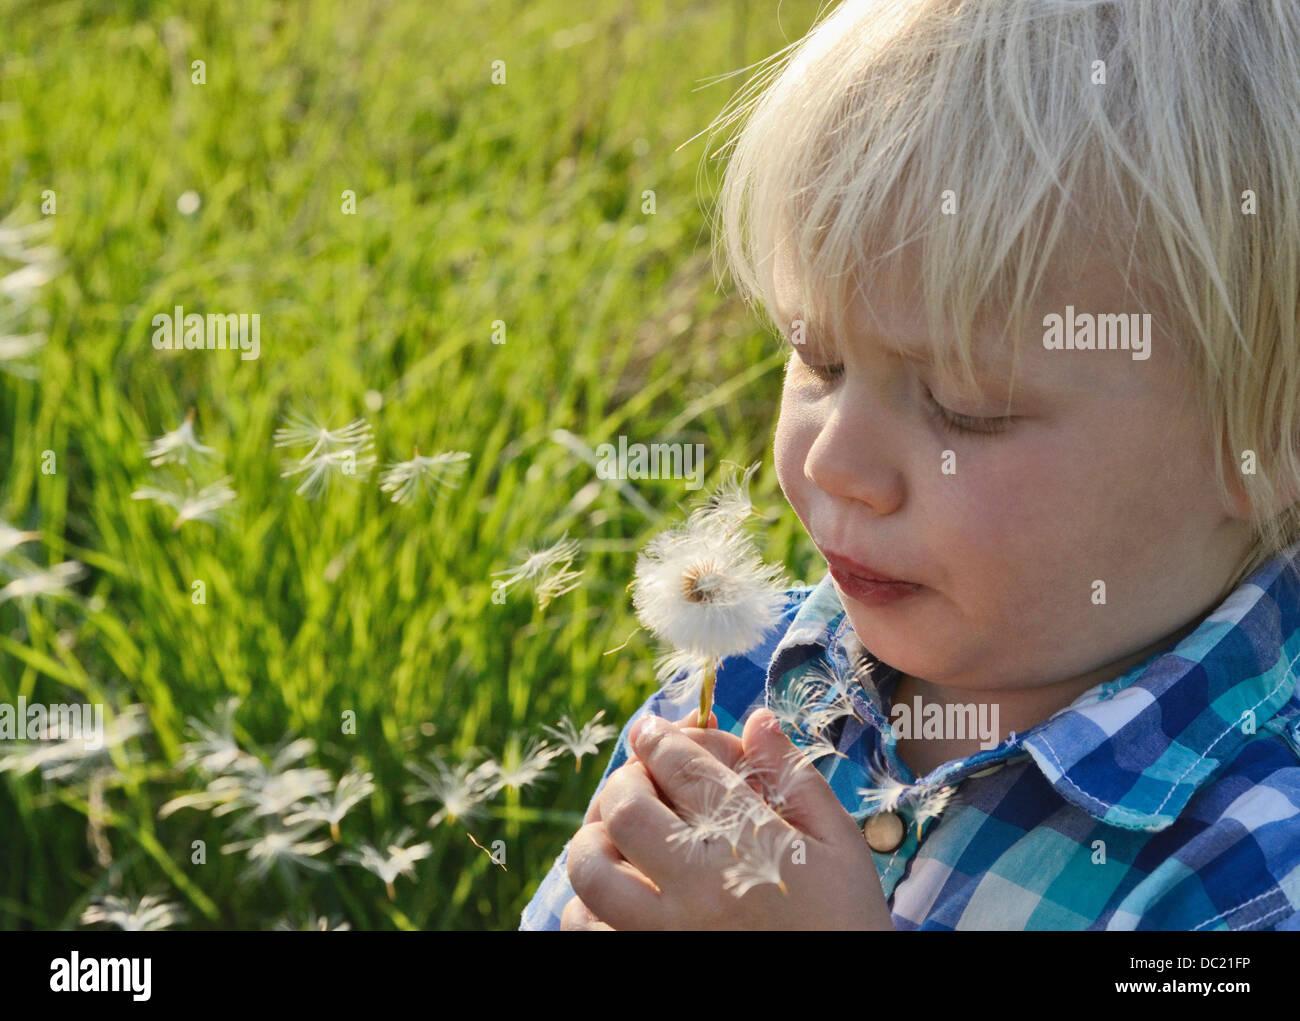 Boy blowing dandelion clock, close up - Stock Image